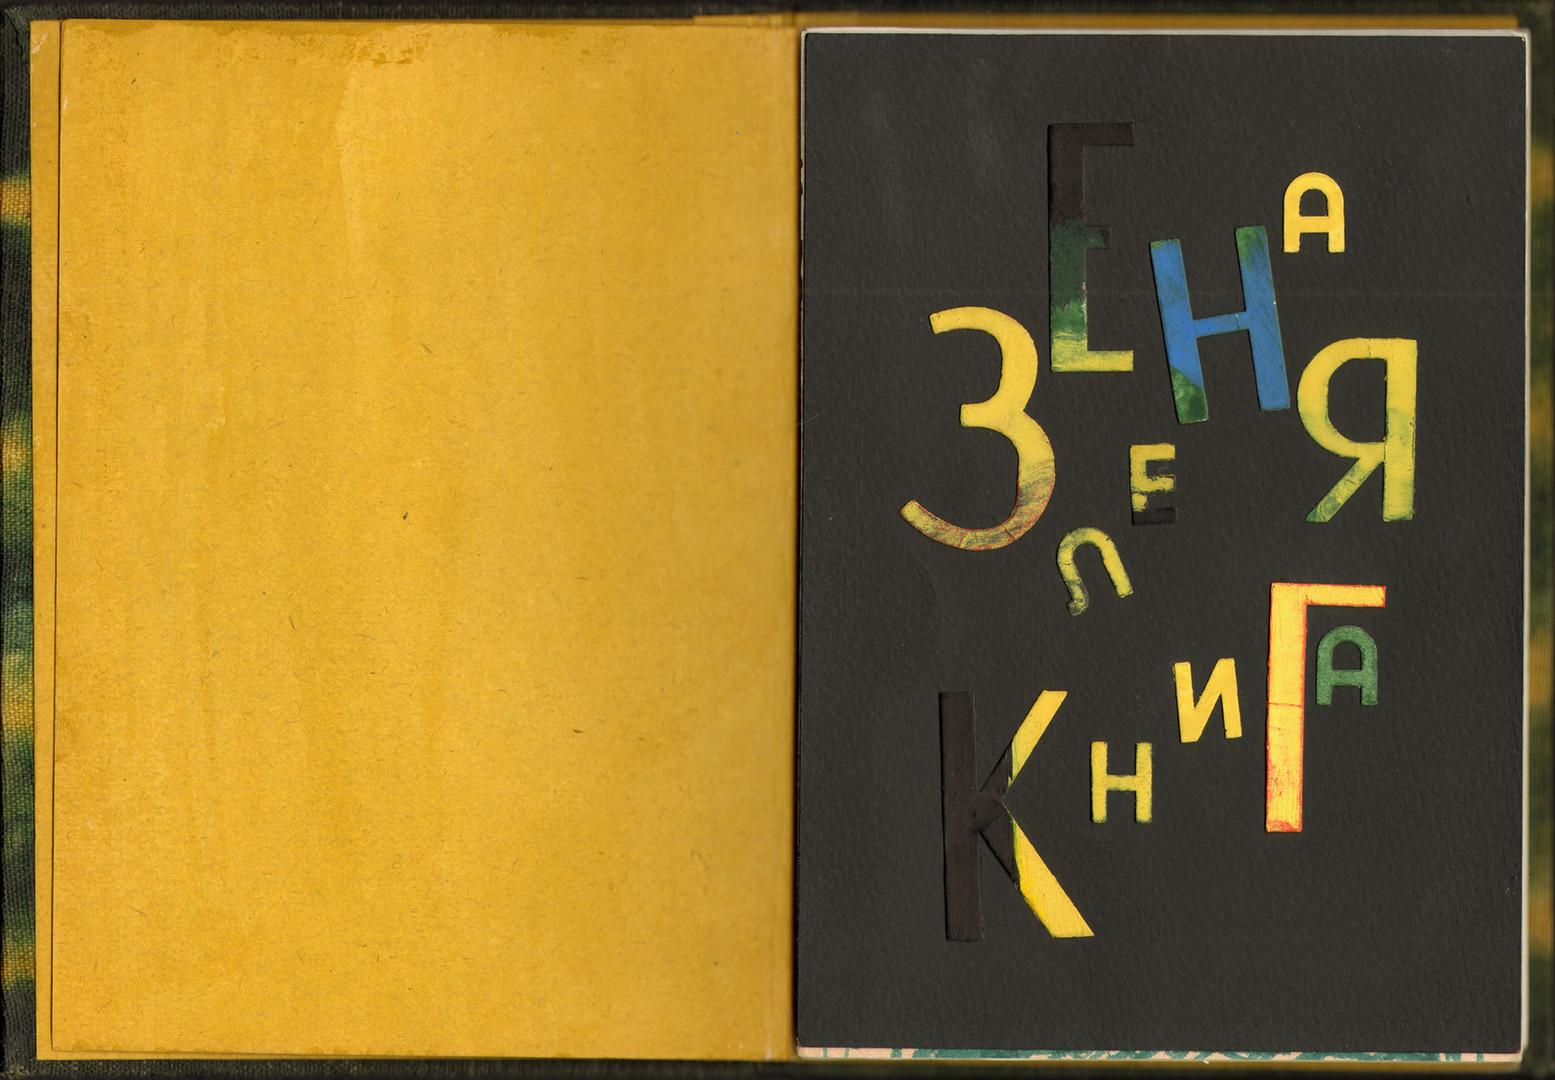 1989 ЗЕЛЕНАЯ КНИГА экз.№3, (разварот 2), см. техника, 21,7х31,3 см.